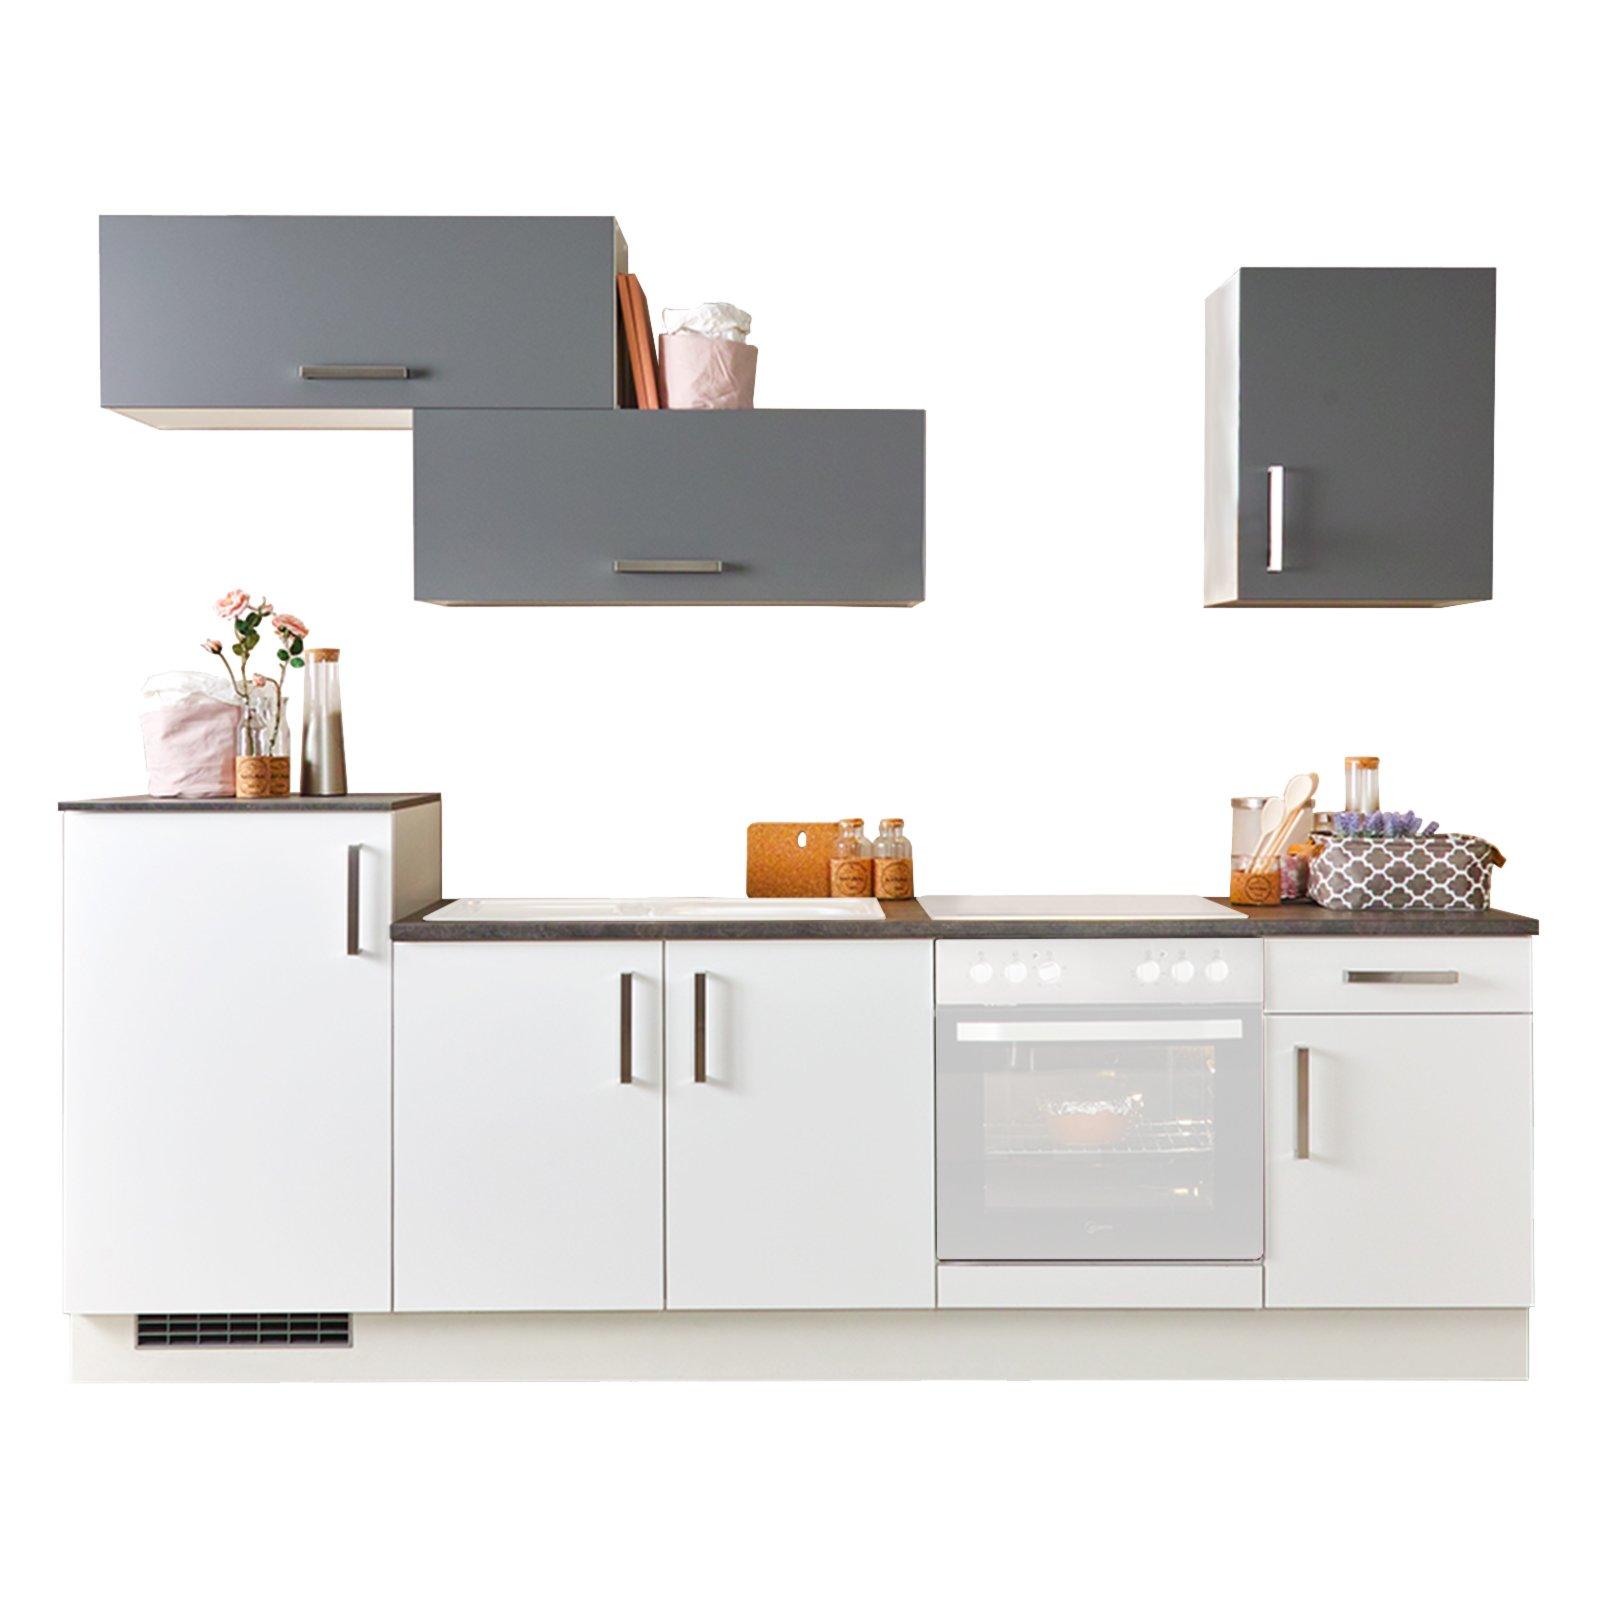 k chenblock mia lacklaminat wei schiefergrau 270 cm k chenzeilen ohne e ger te. Black Bedroom Furniture Sets. Home Design Ideas